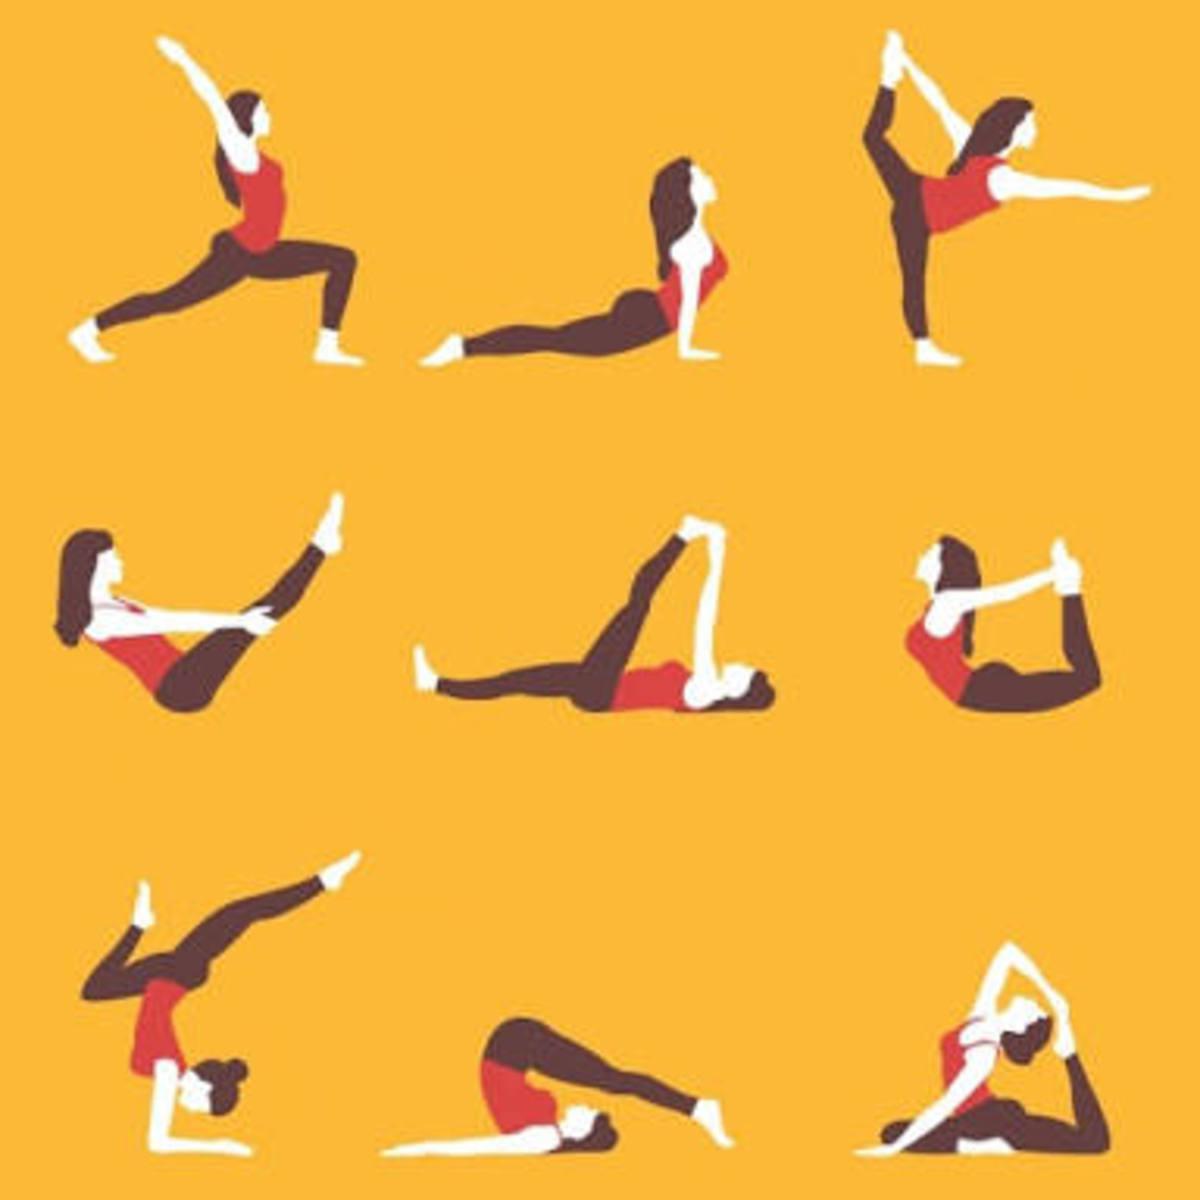 Different Yogic postures